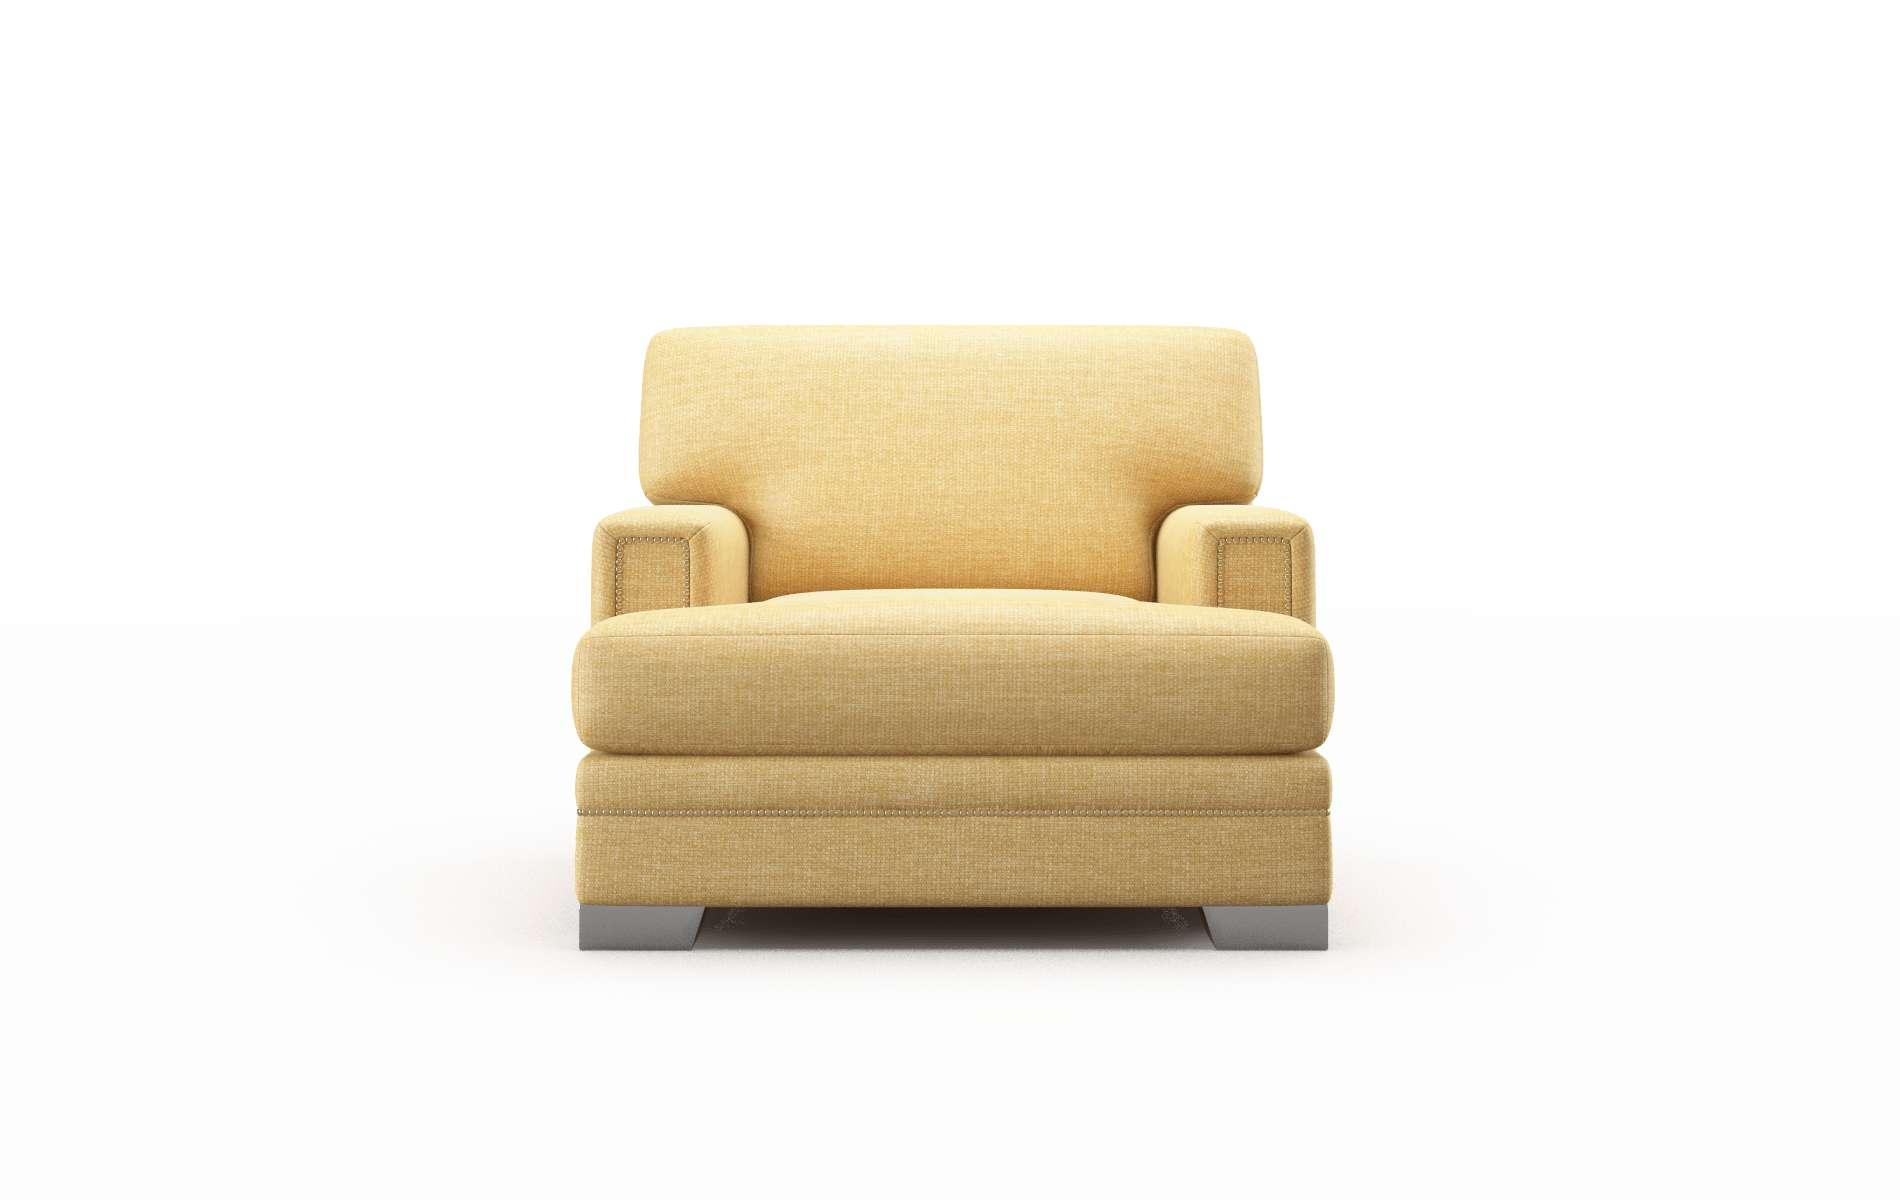 Barcelona Keylargo Honey chair metal legs